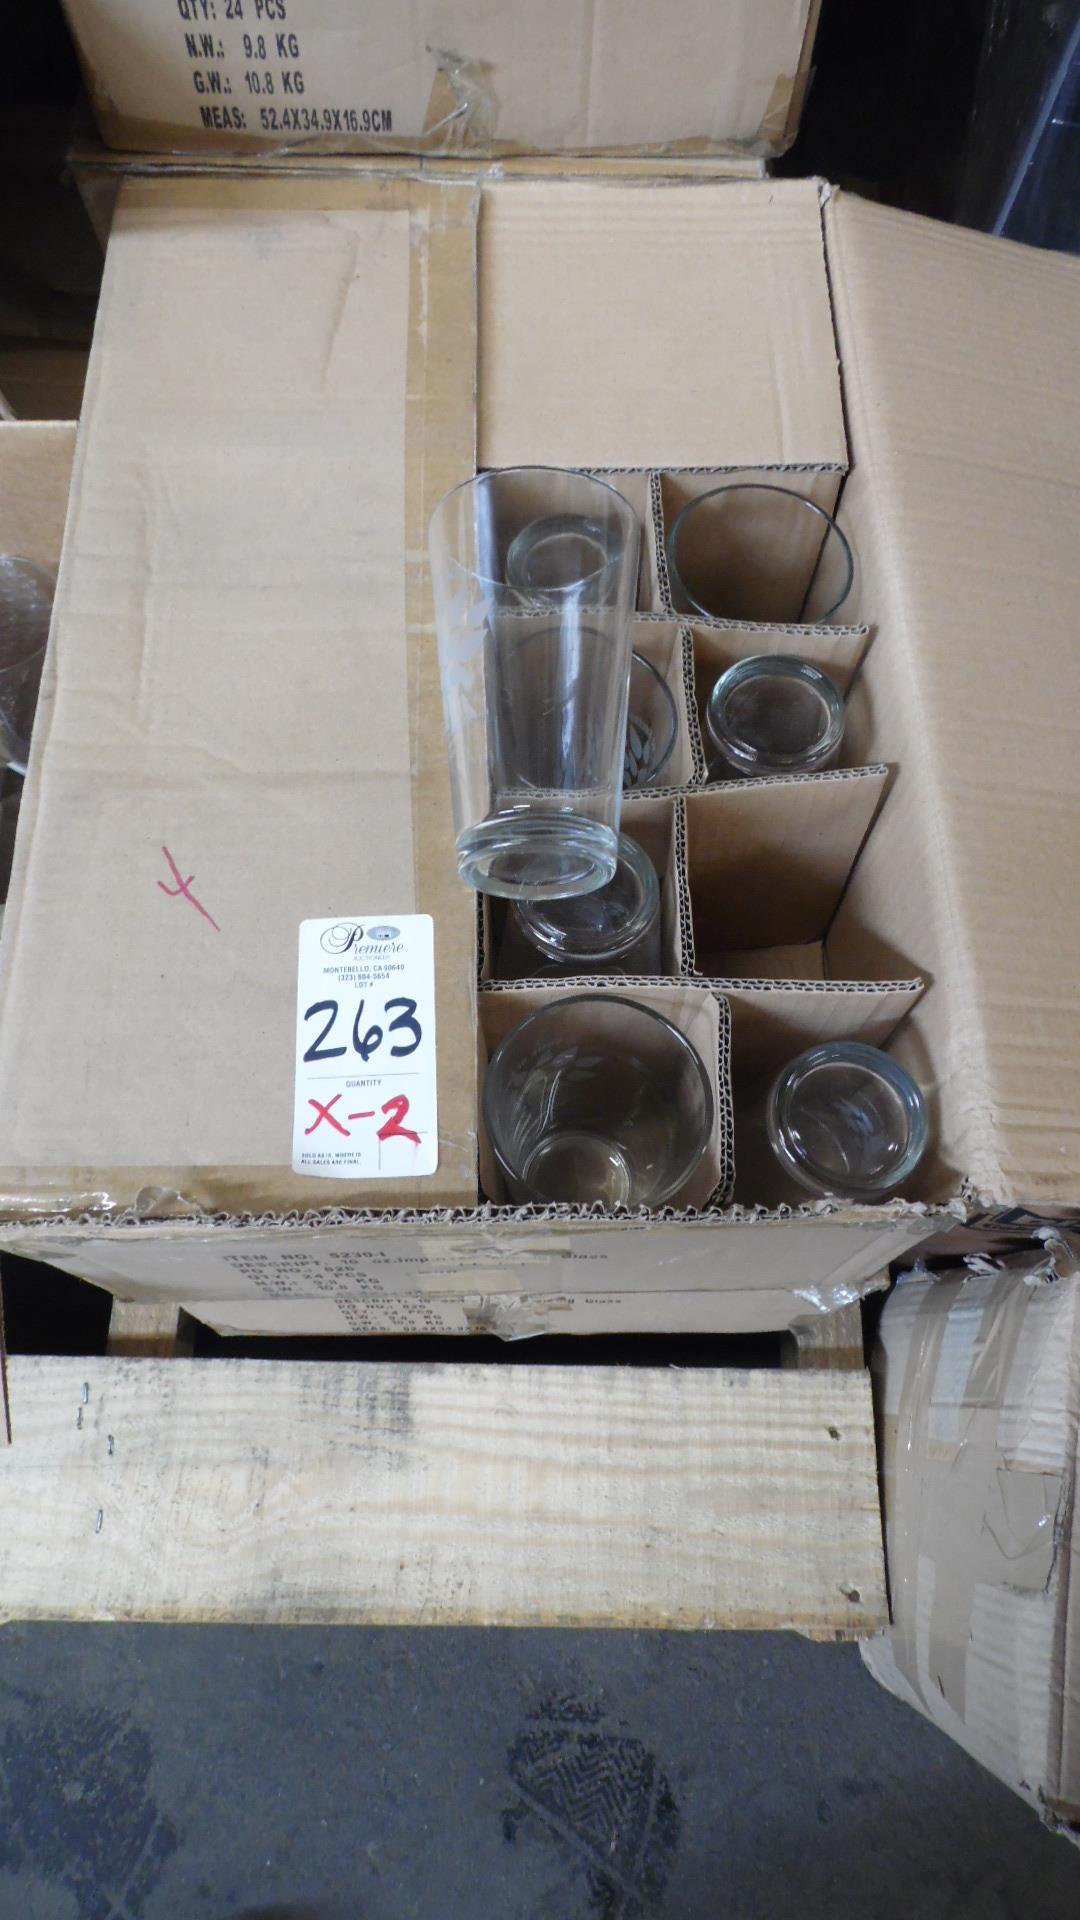 Lot 263 - TASTE OF ENCINO GLASSES